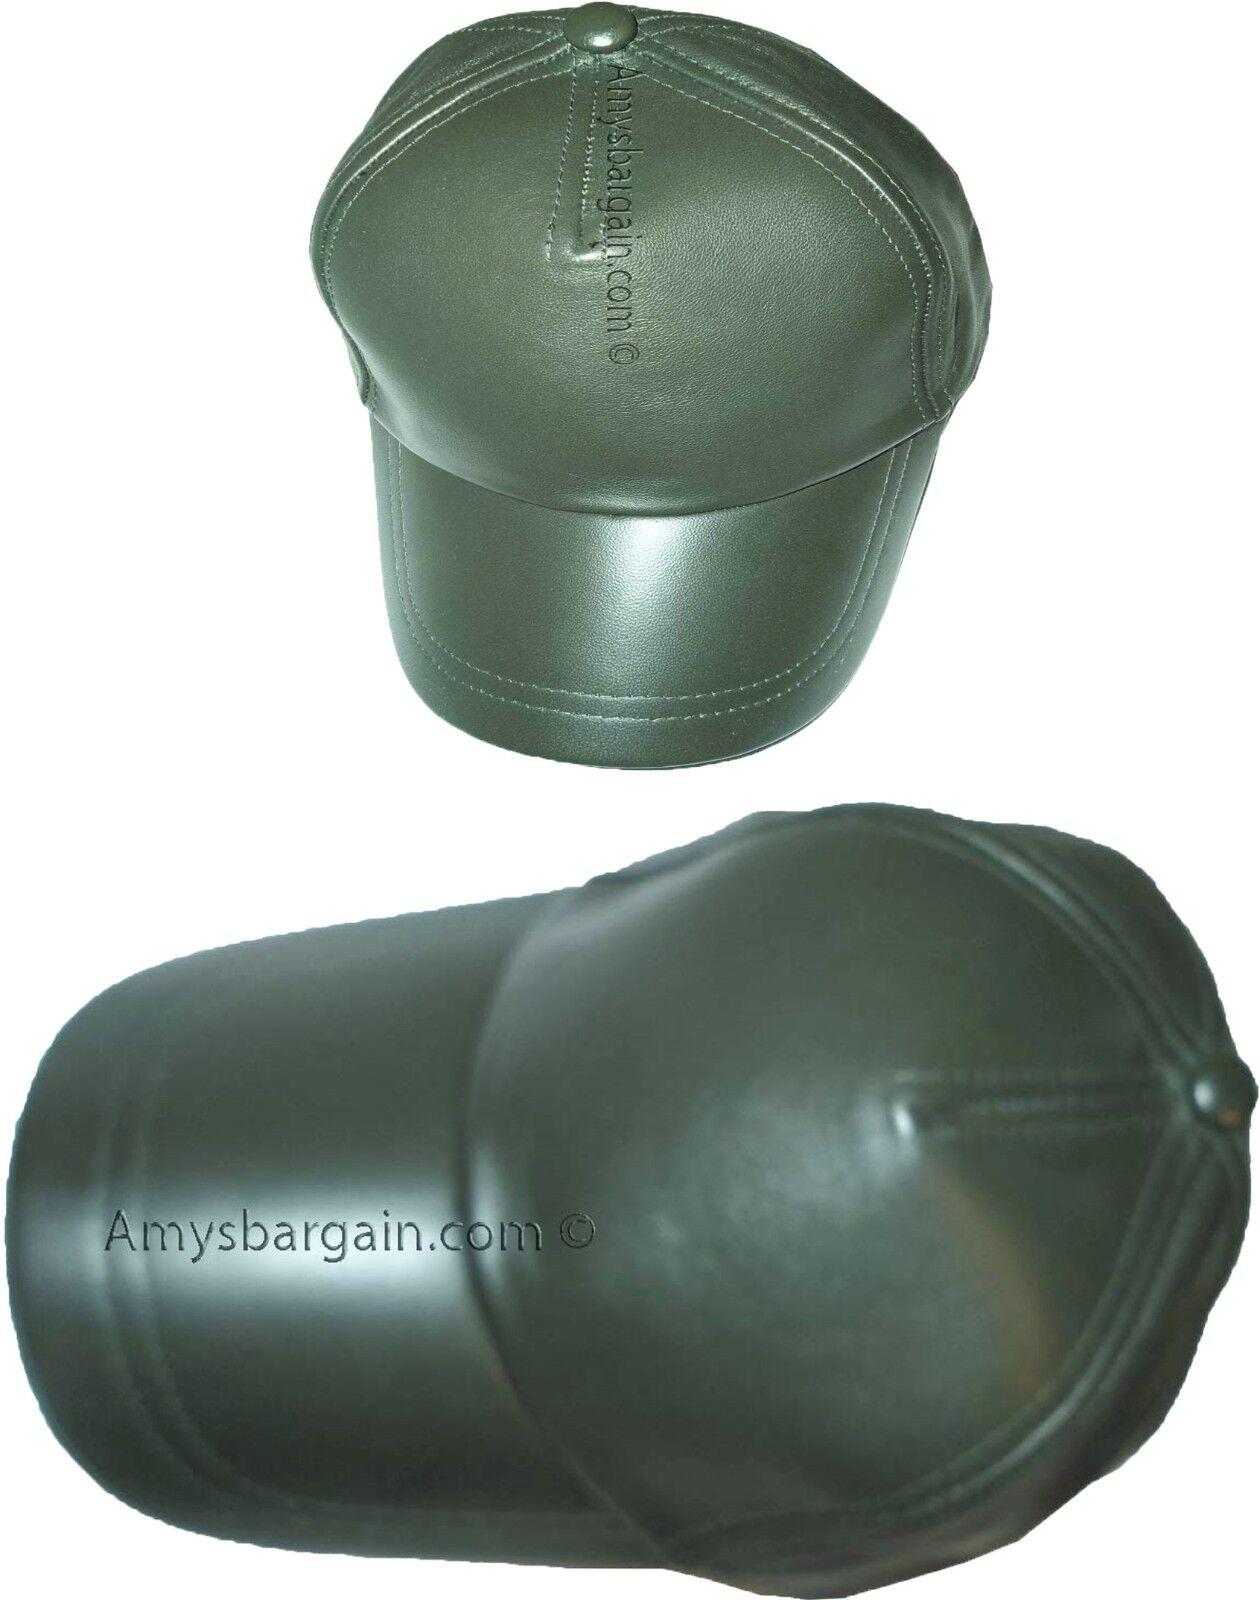 Lot Baseball of 2 New leather Baseball Lot caps Green leather cap Head wear fashion hat BNWT 72a91d